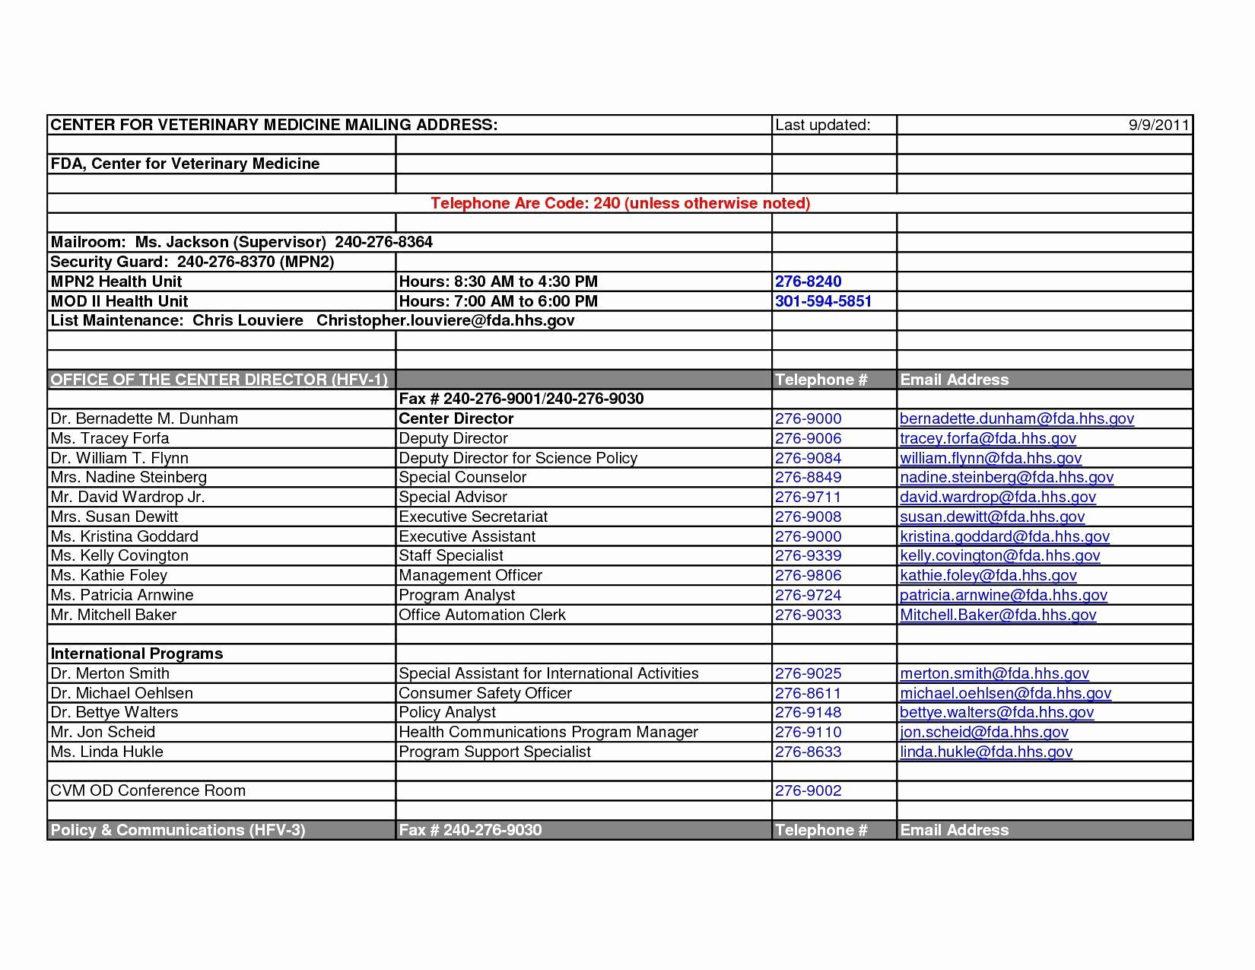 Nist 800 53A Rev 4 Spreadsheet Unique Resource Planning Template With Resource Planning Spreadsheet